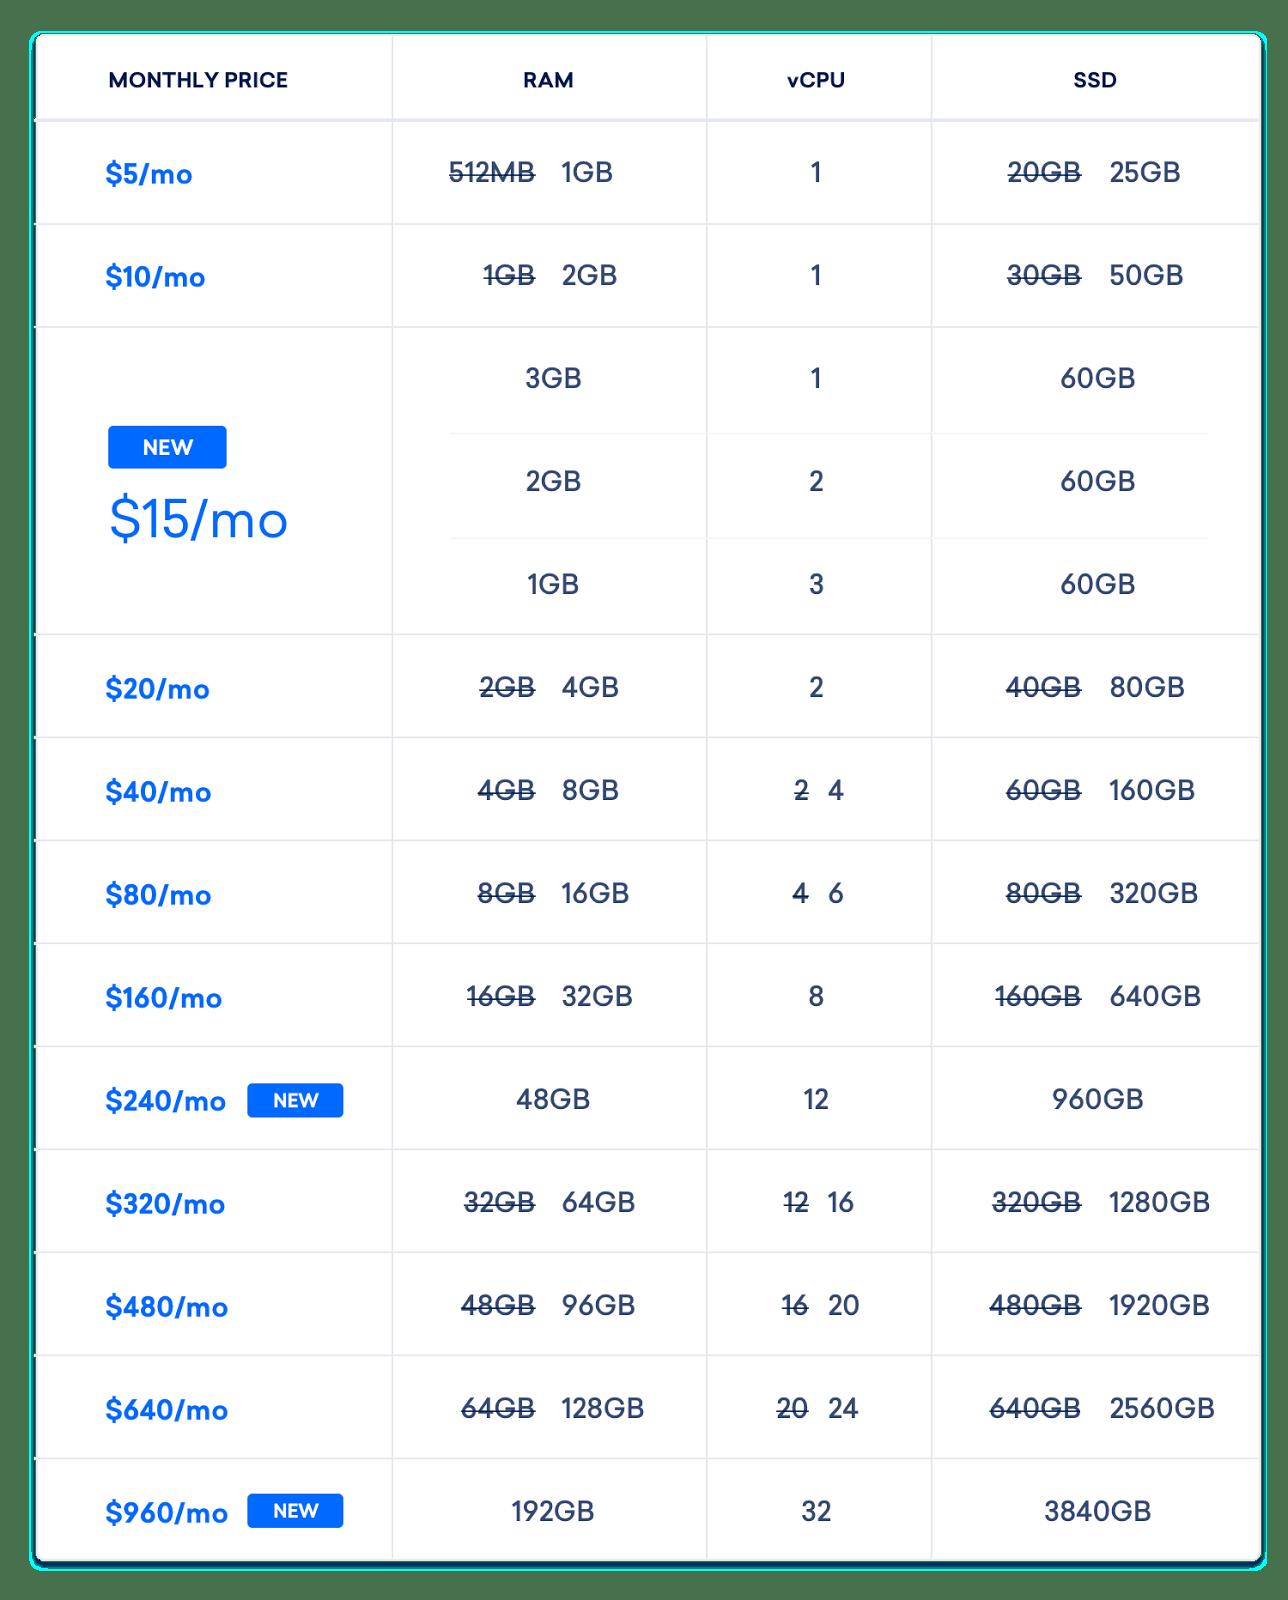 Standard Plans Table